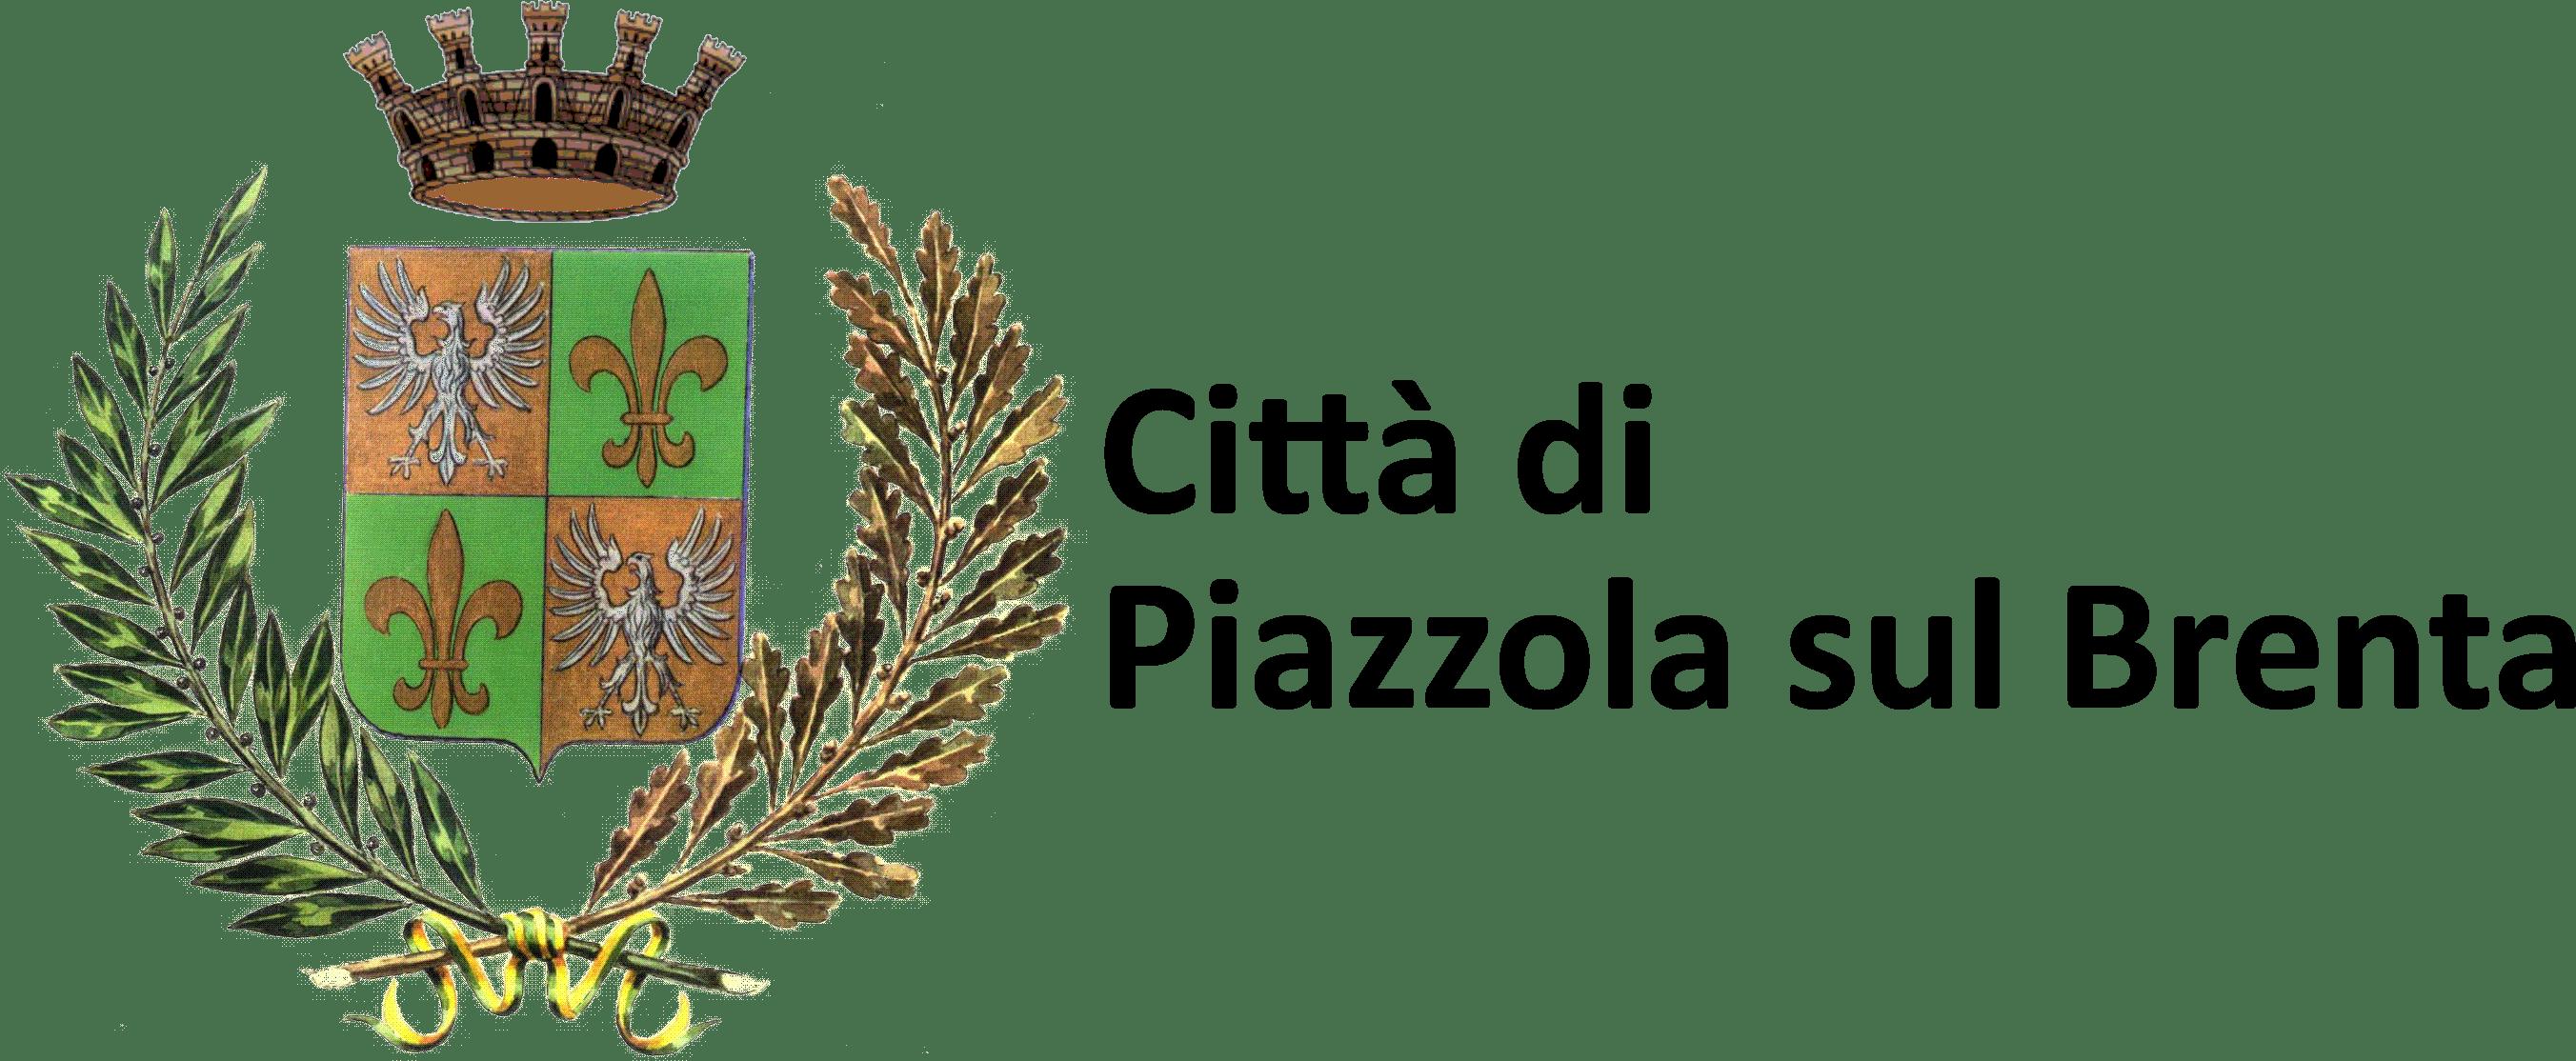 Piazzola sul Brenta